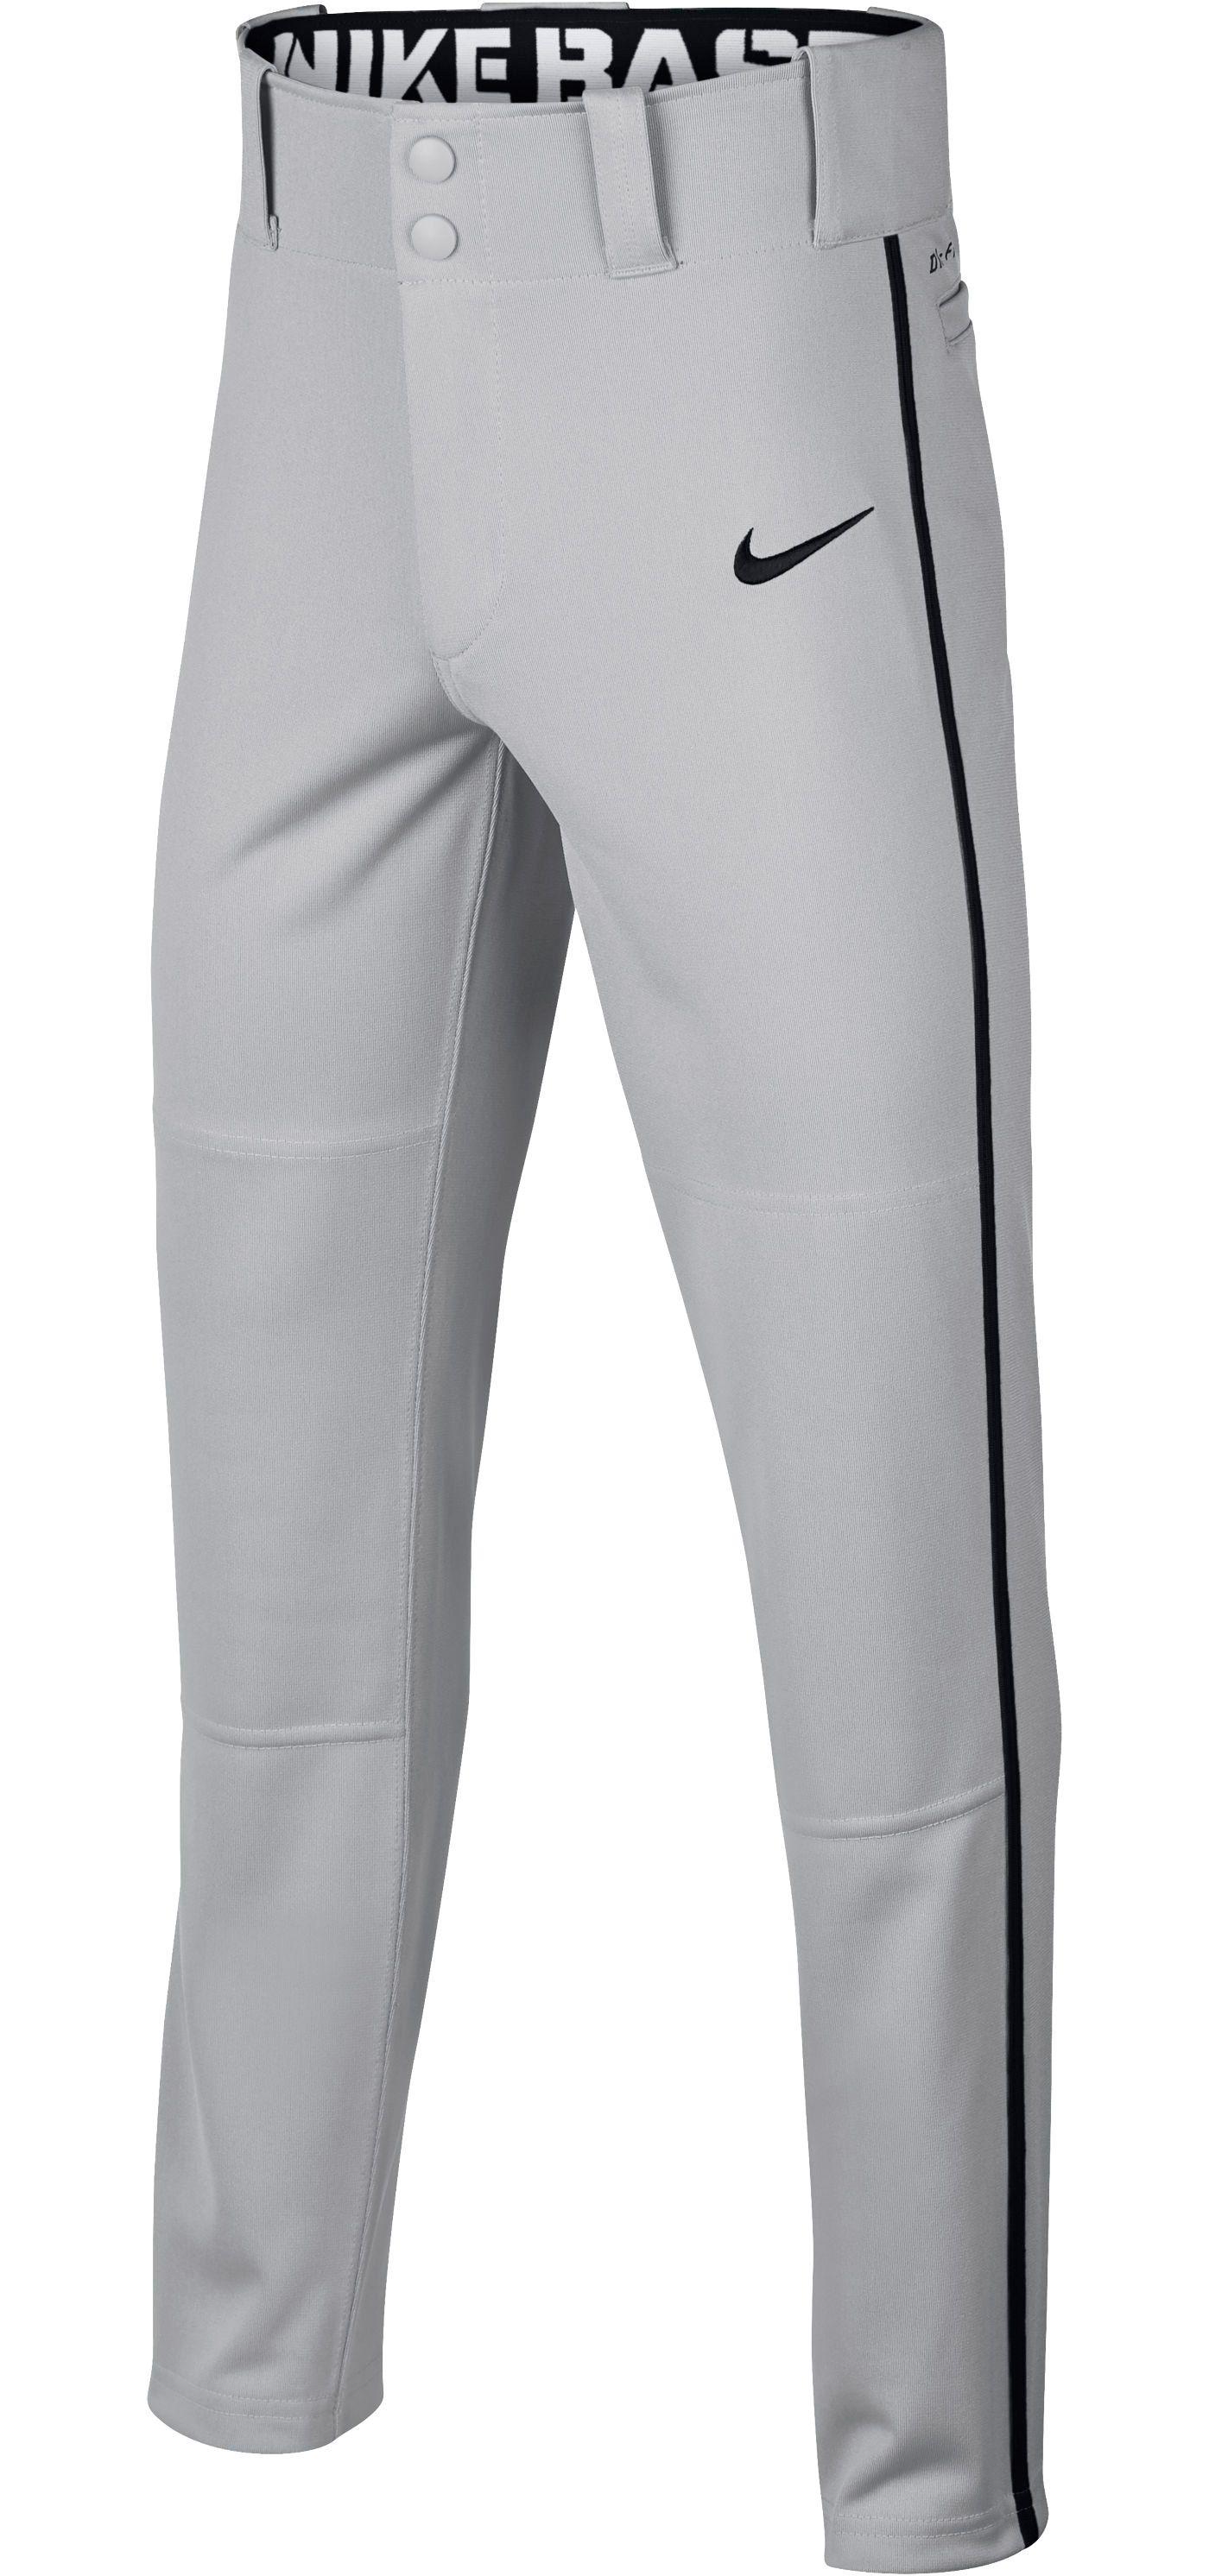 Nike Boys' Swoosh Piped Dri-FIT Baseball Pants